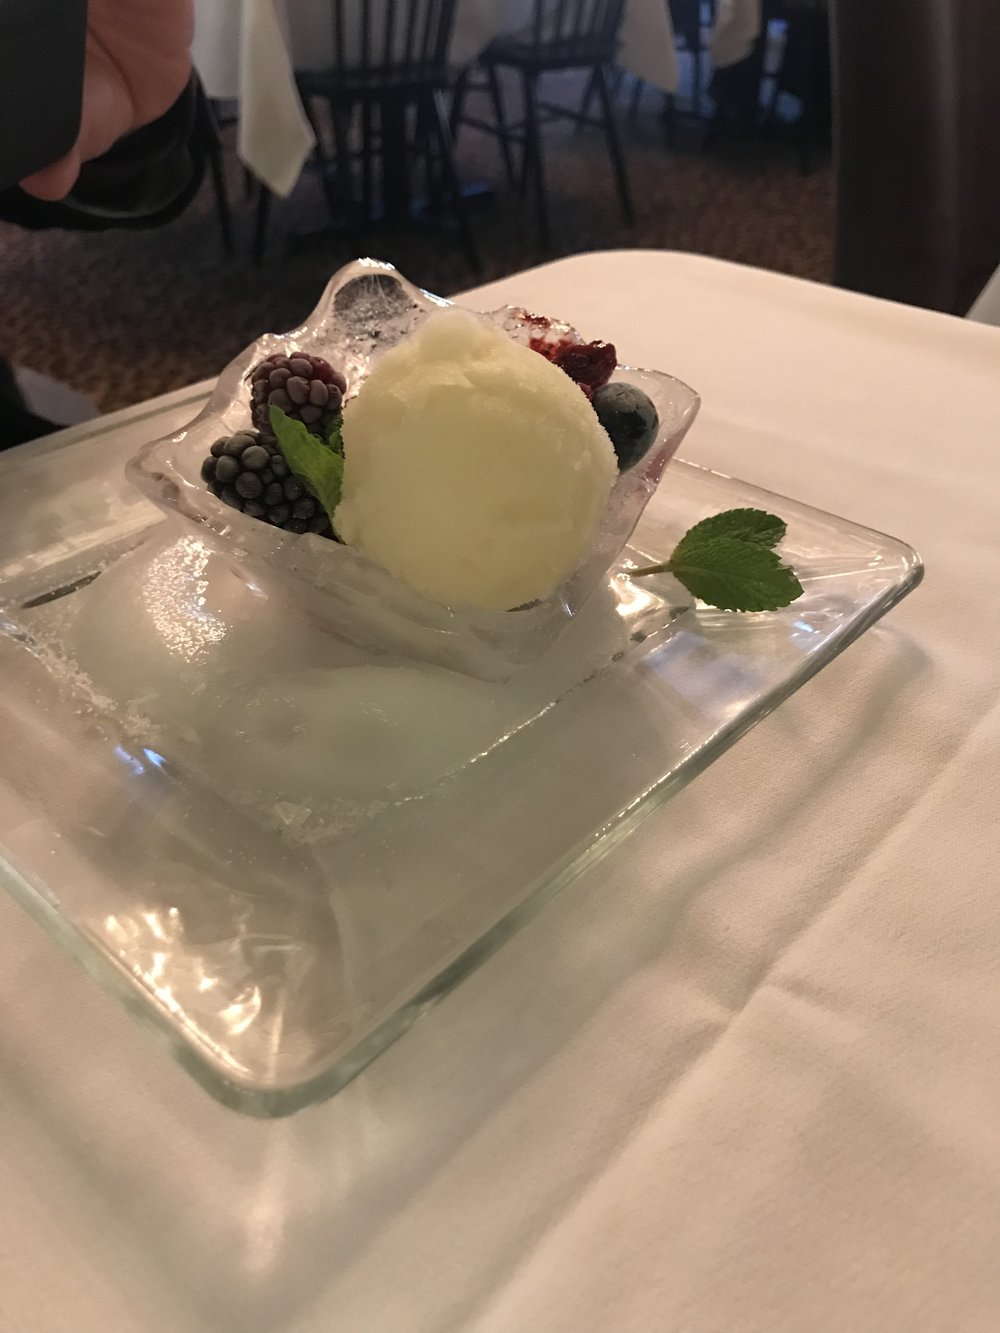 Salty dessert.